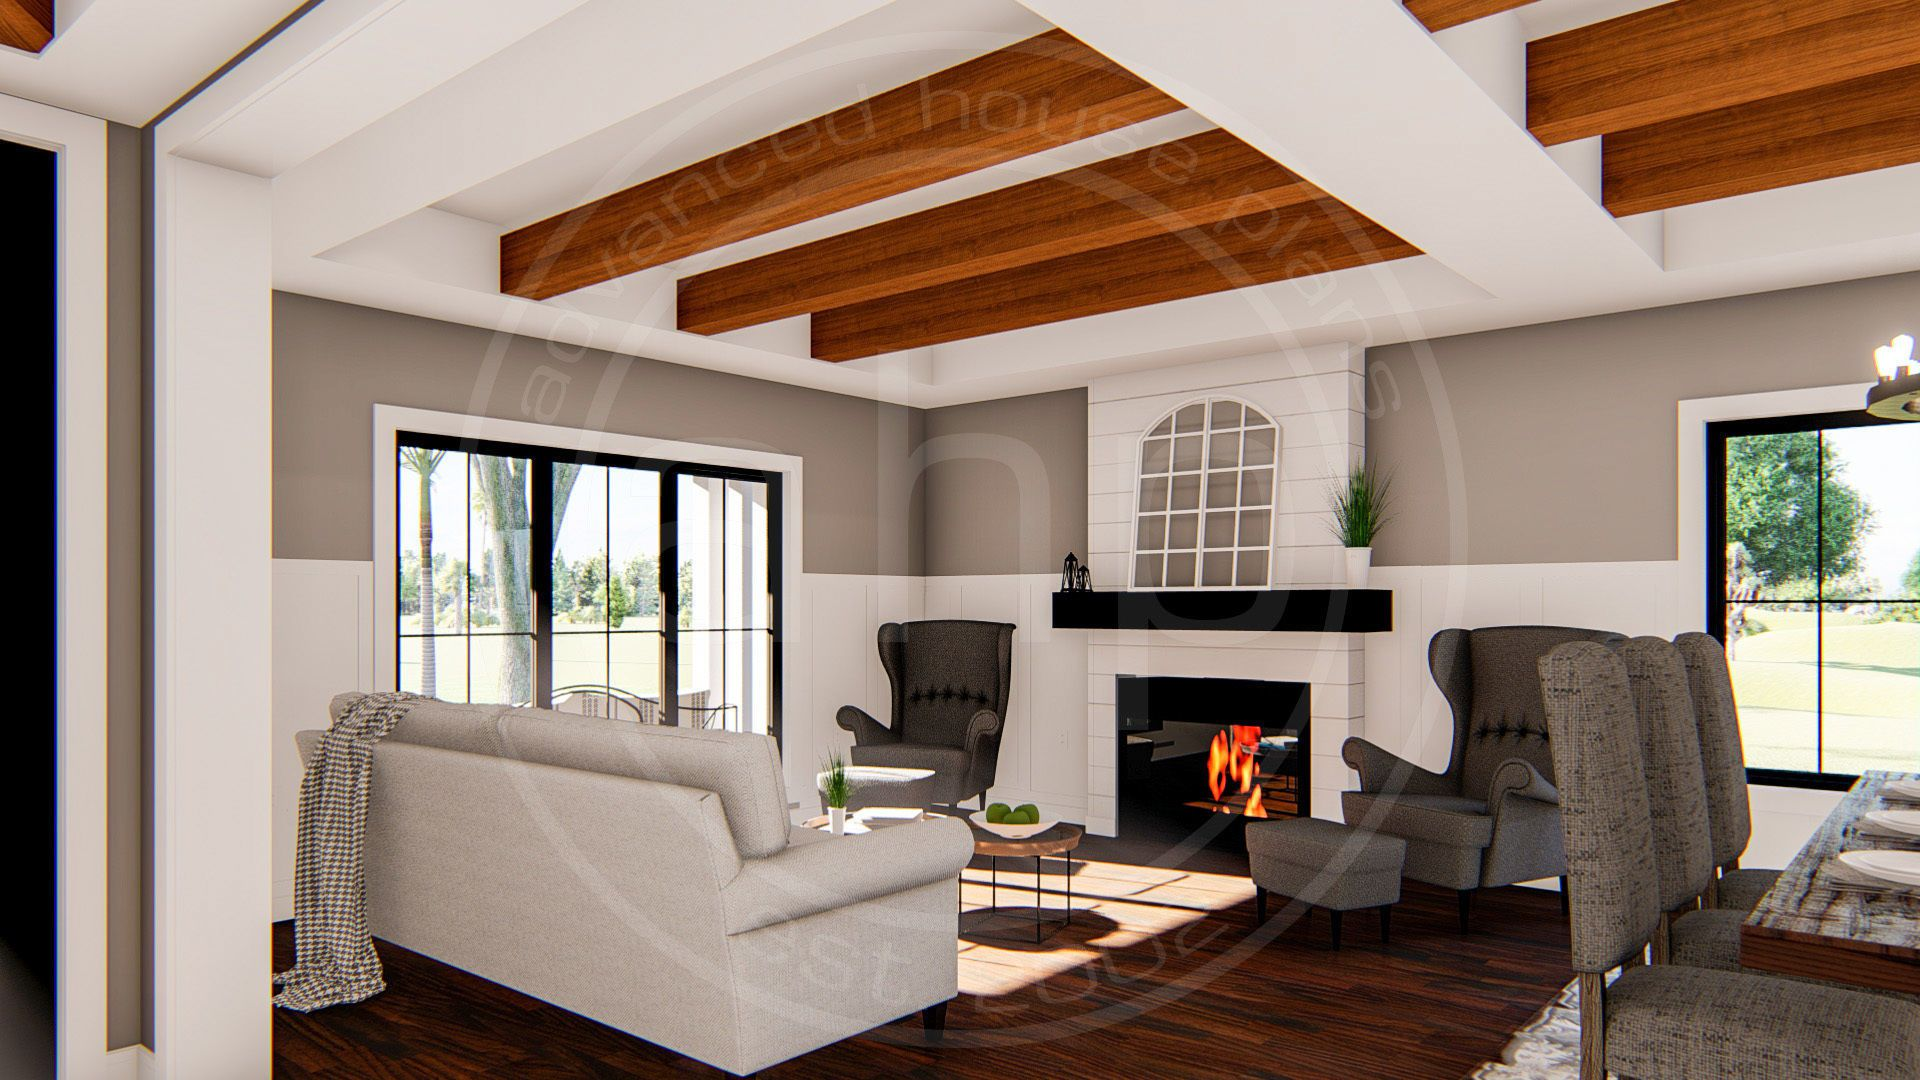 2 Story Modern Farmhouse Plan | Pasadena Flats | House ...